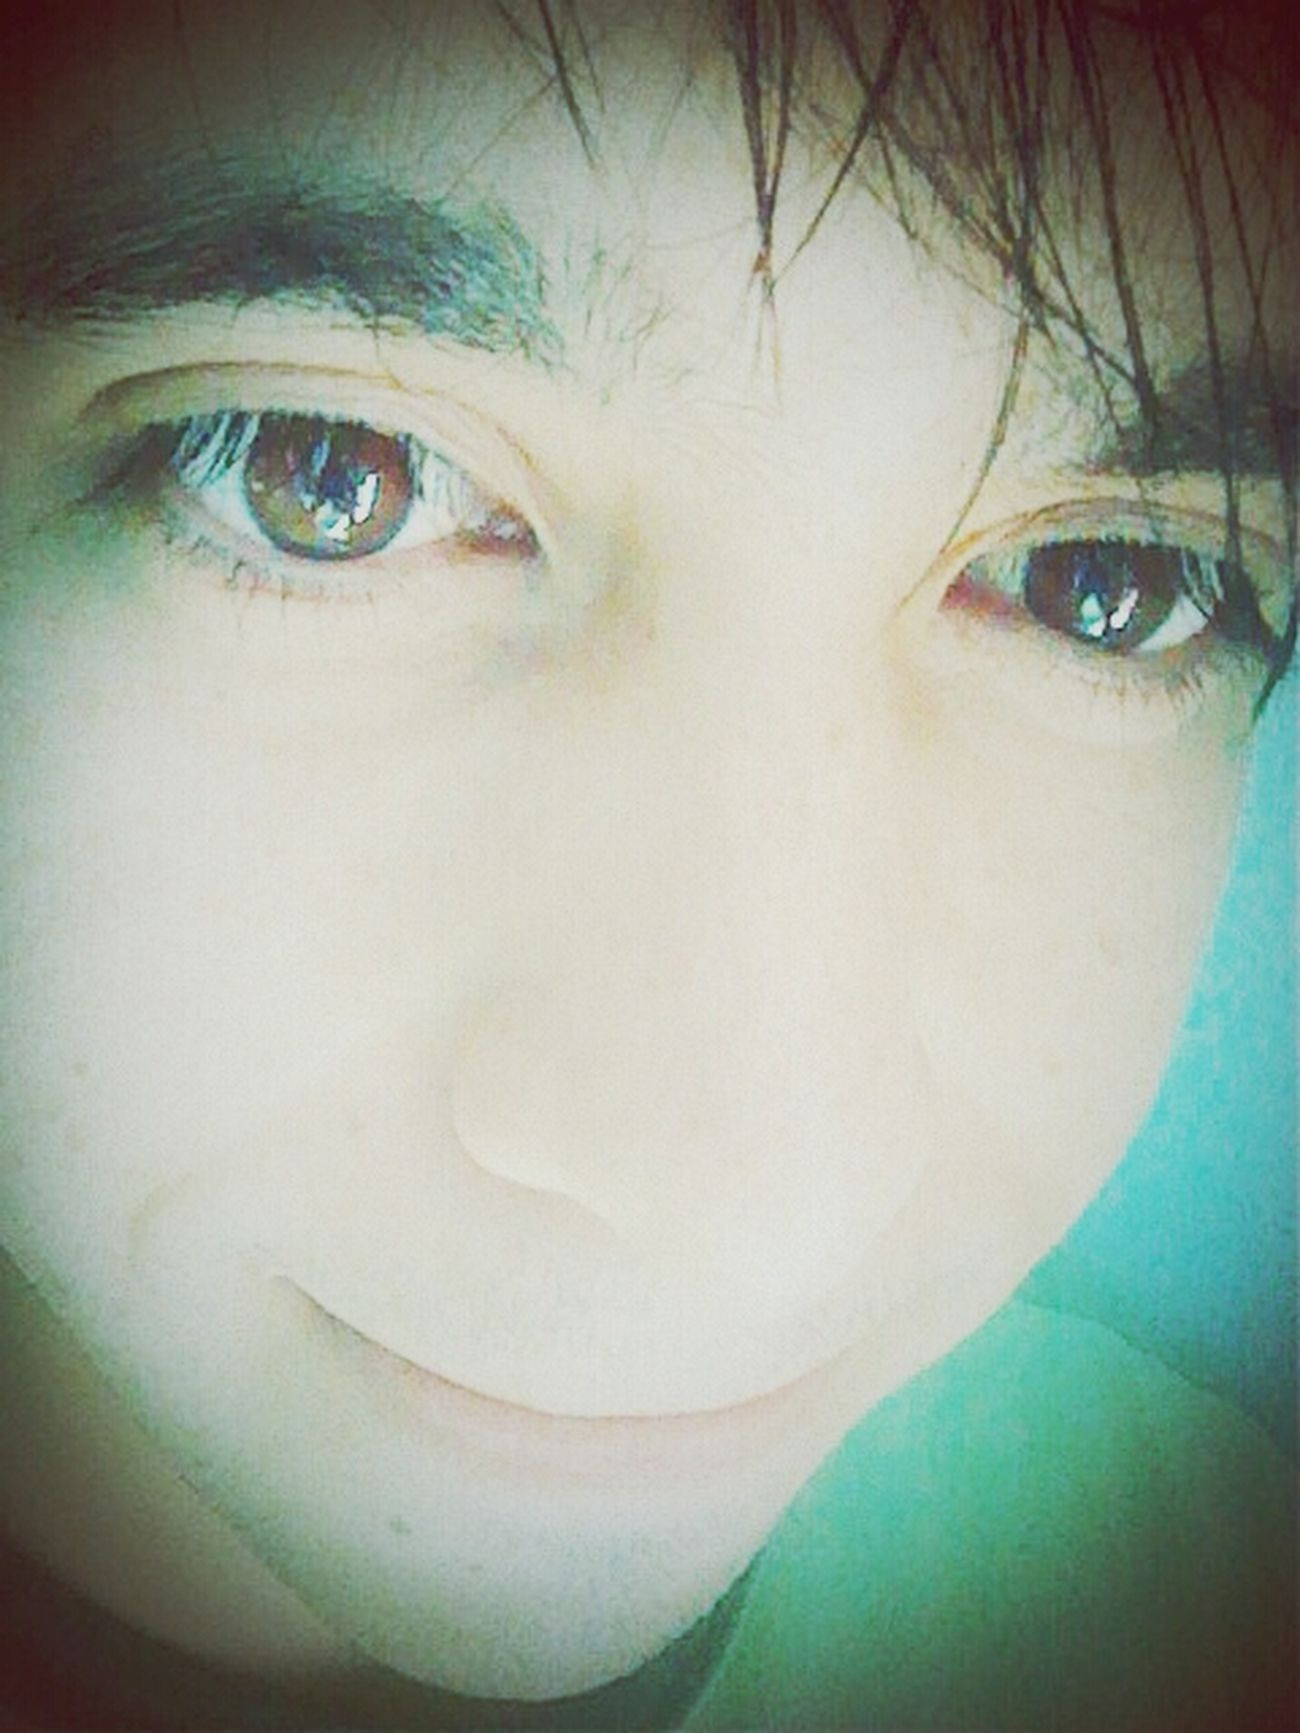 Buenos dias ya despertando bonito dia a todos :)